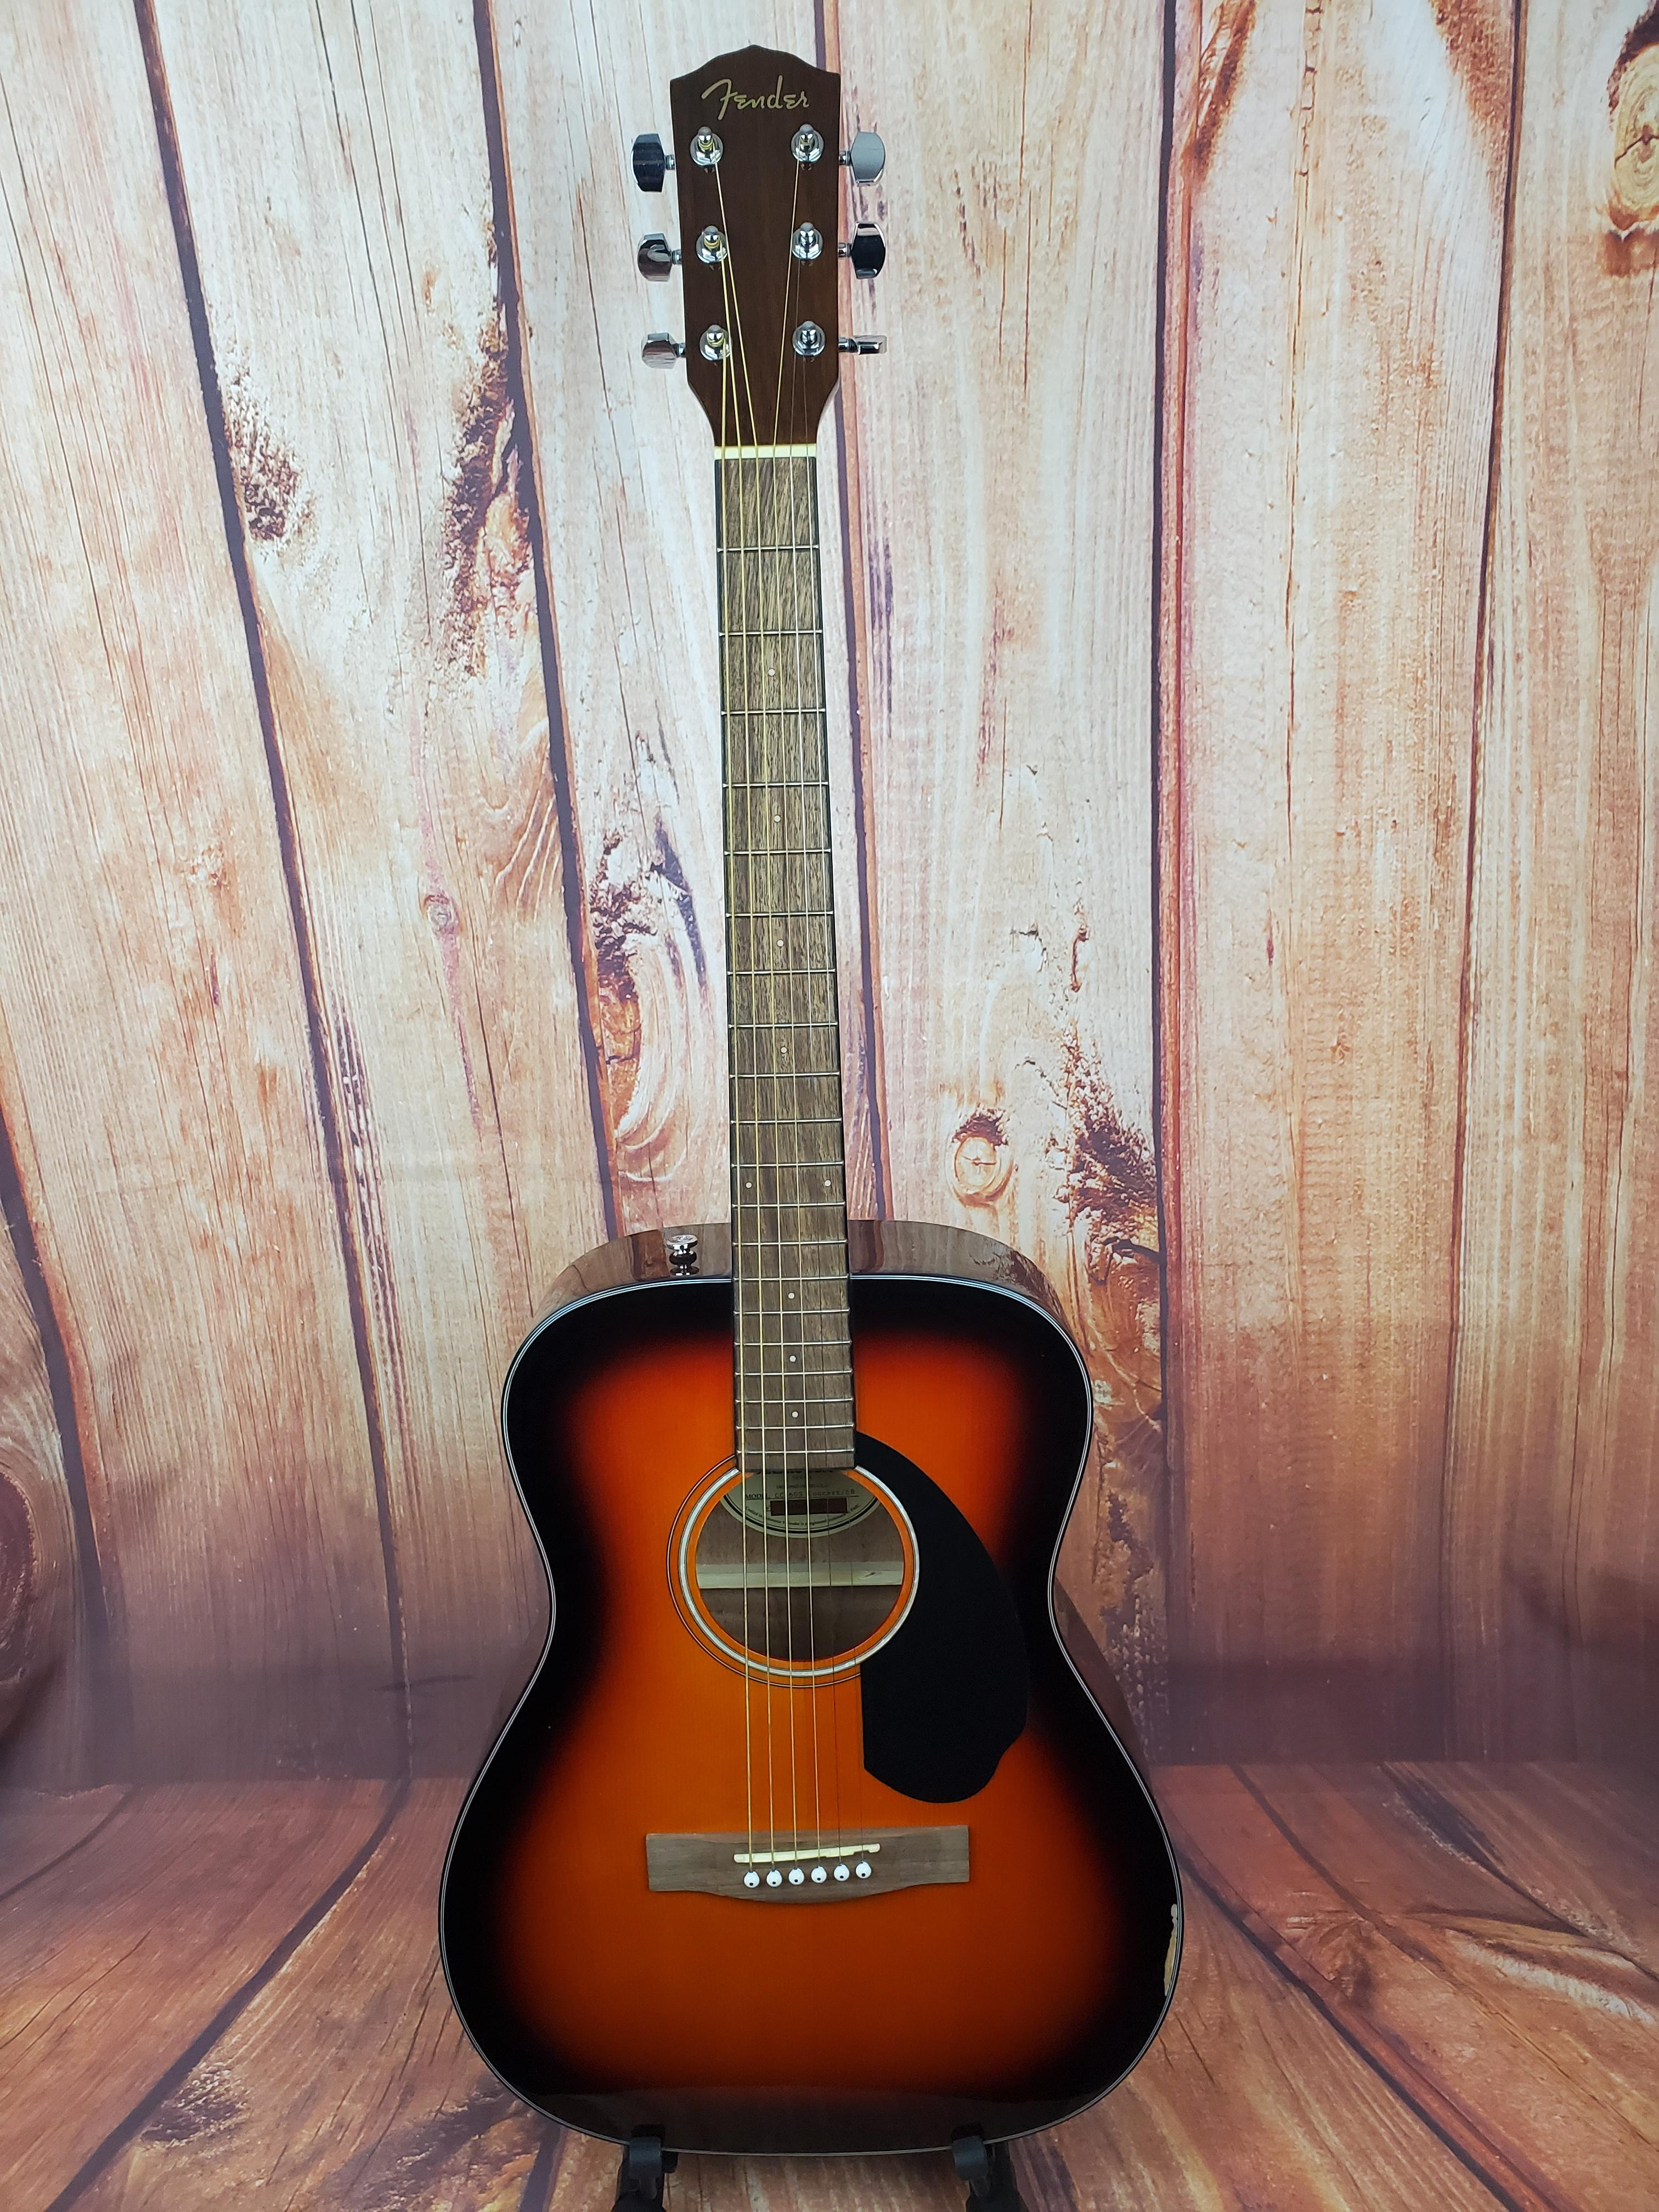 Used- Fender CC-60s Concert Acoustic Guitar